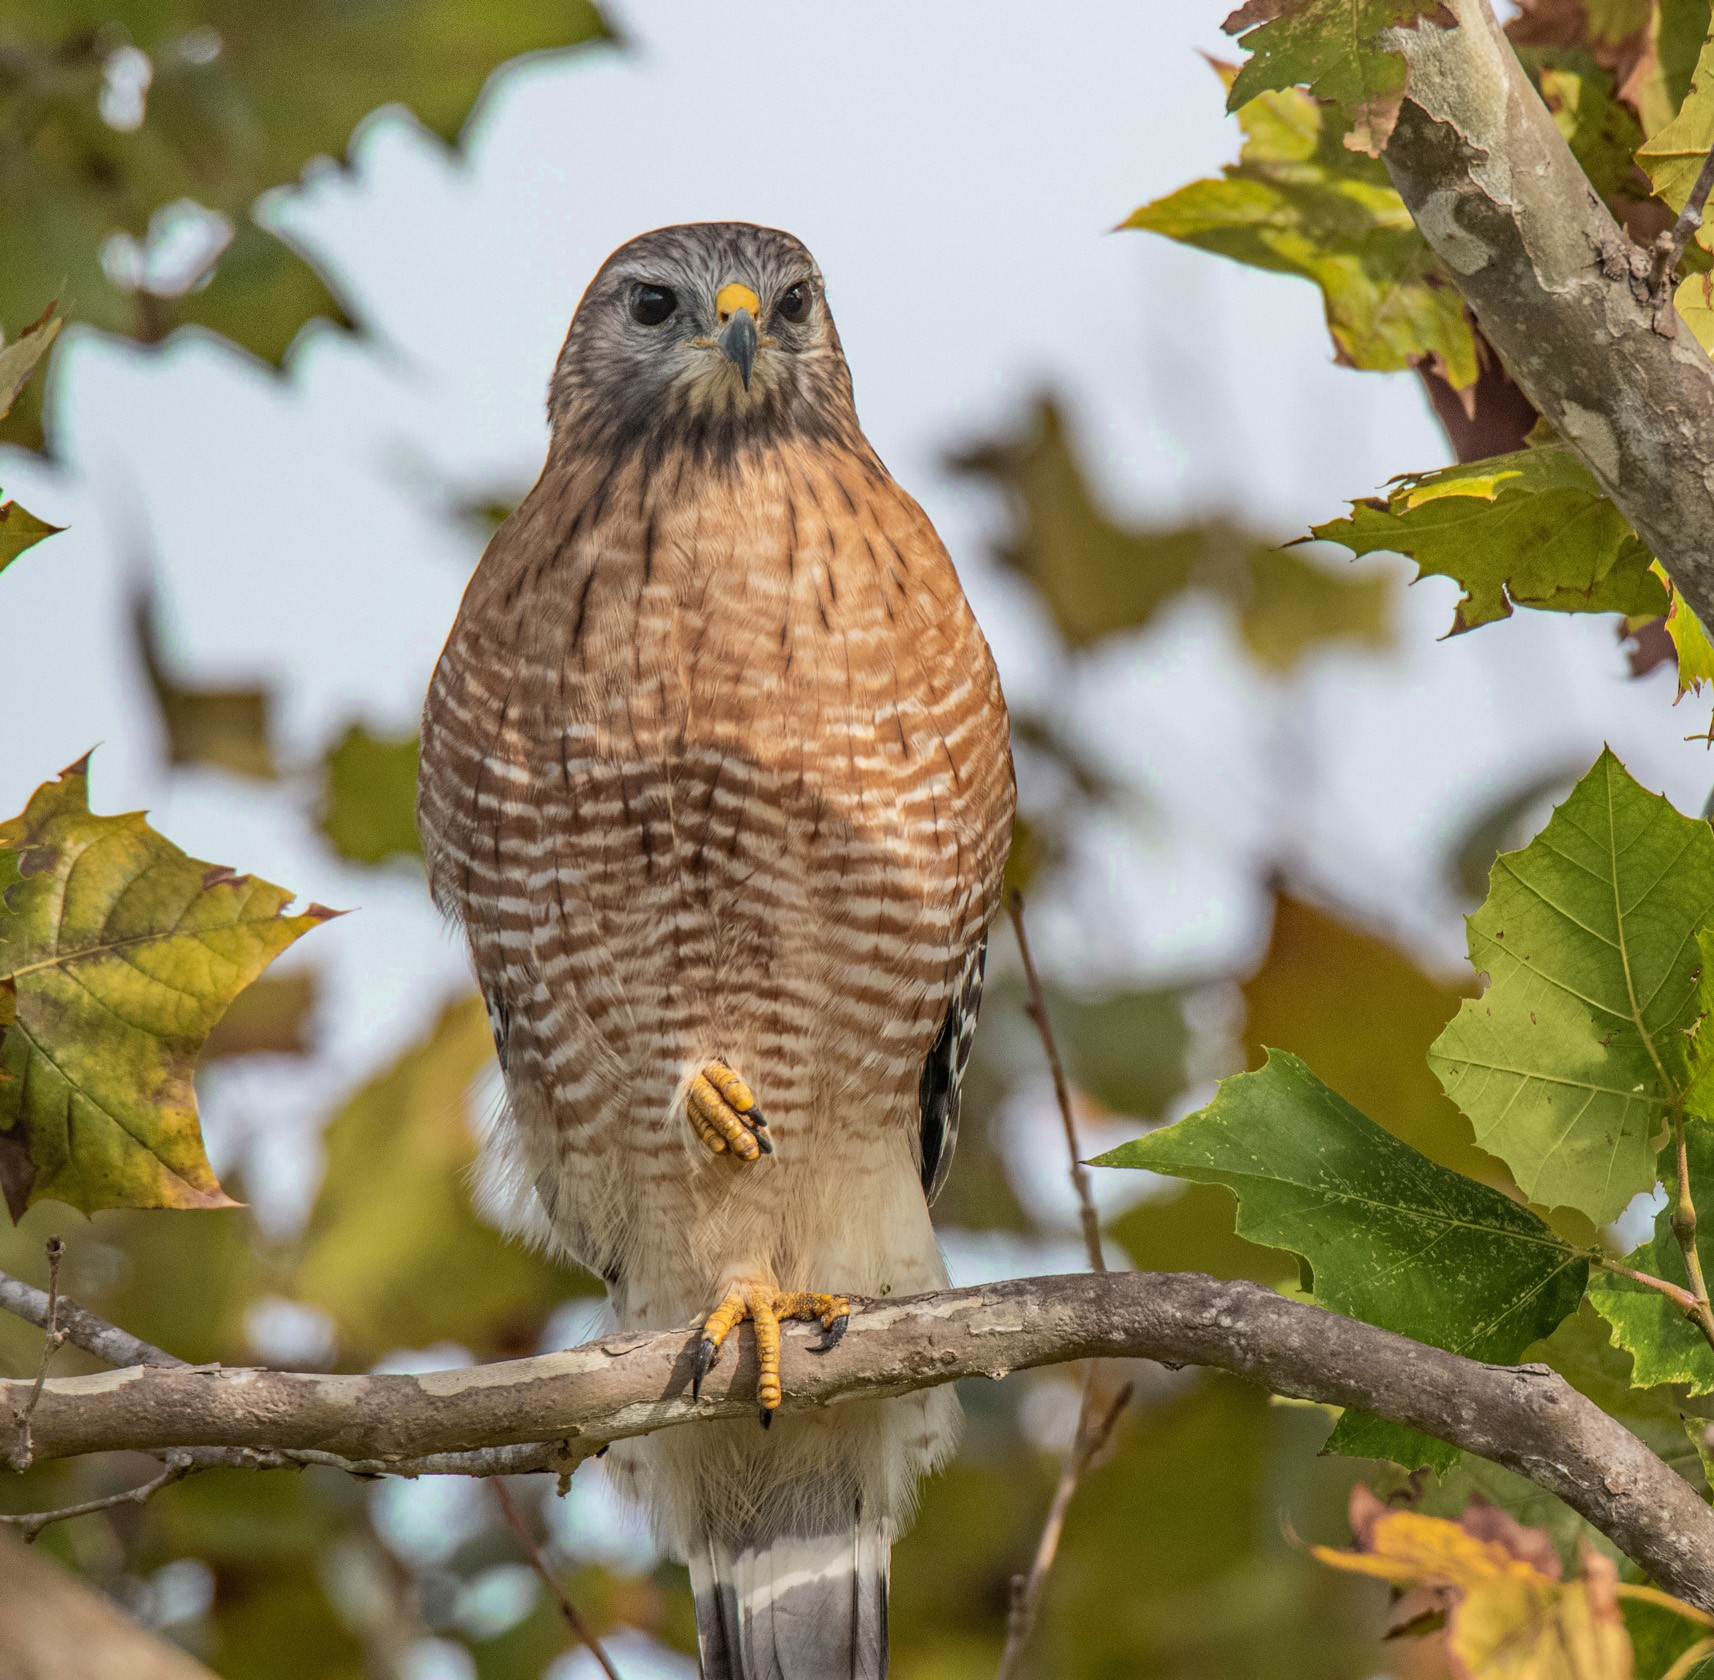 607-red-shouldered-hawk-branch-(2)-rd.jpg